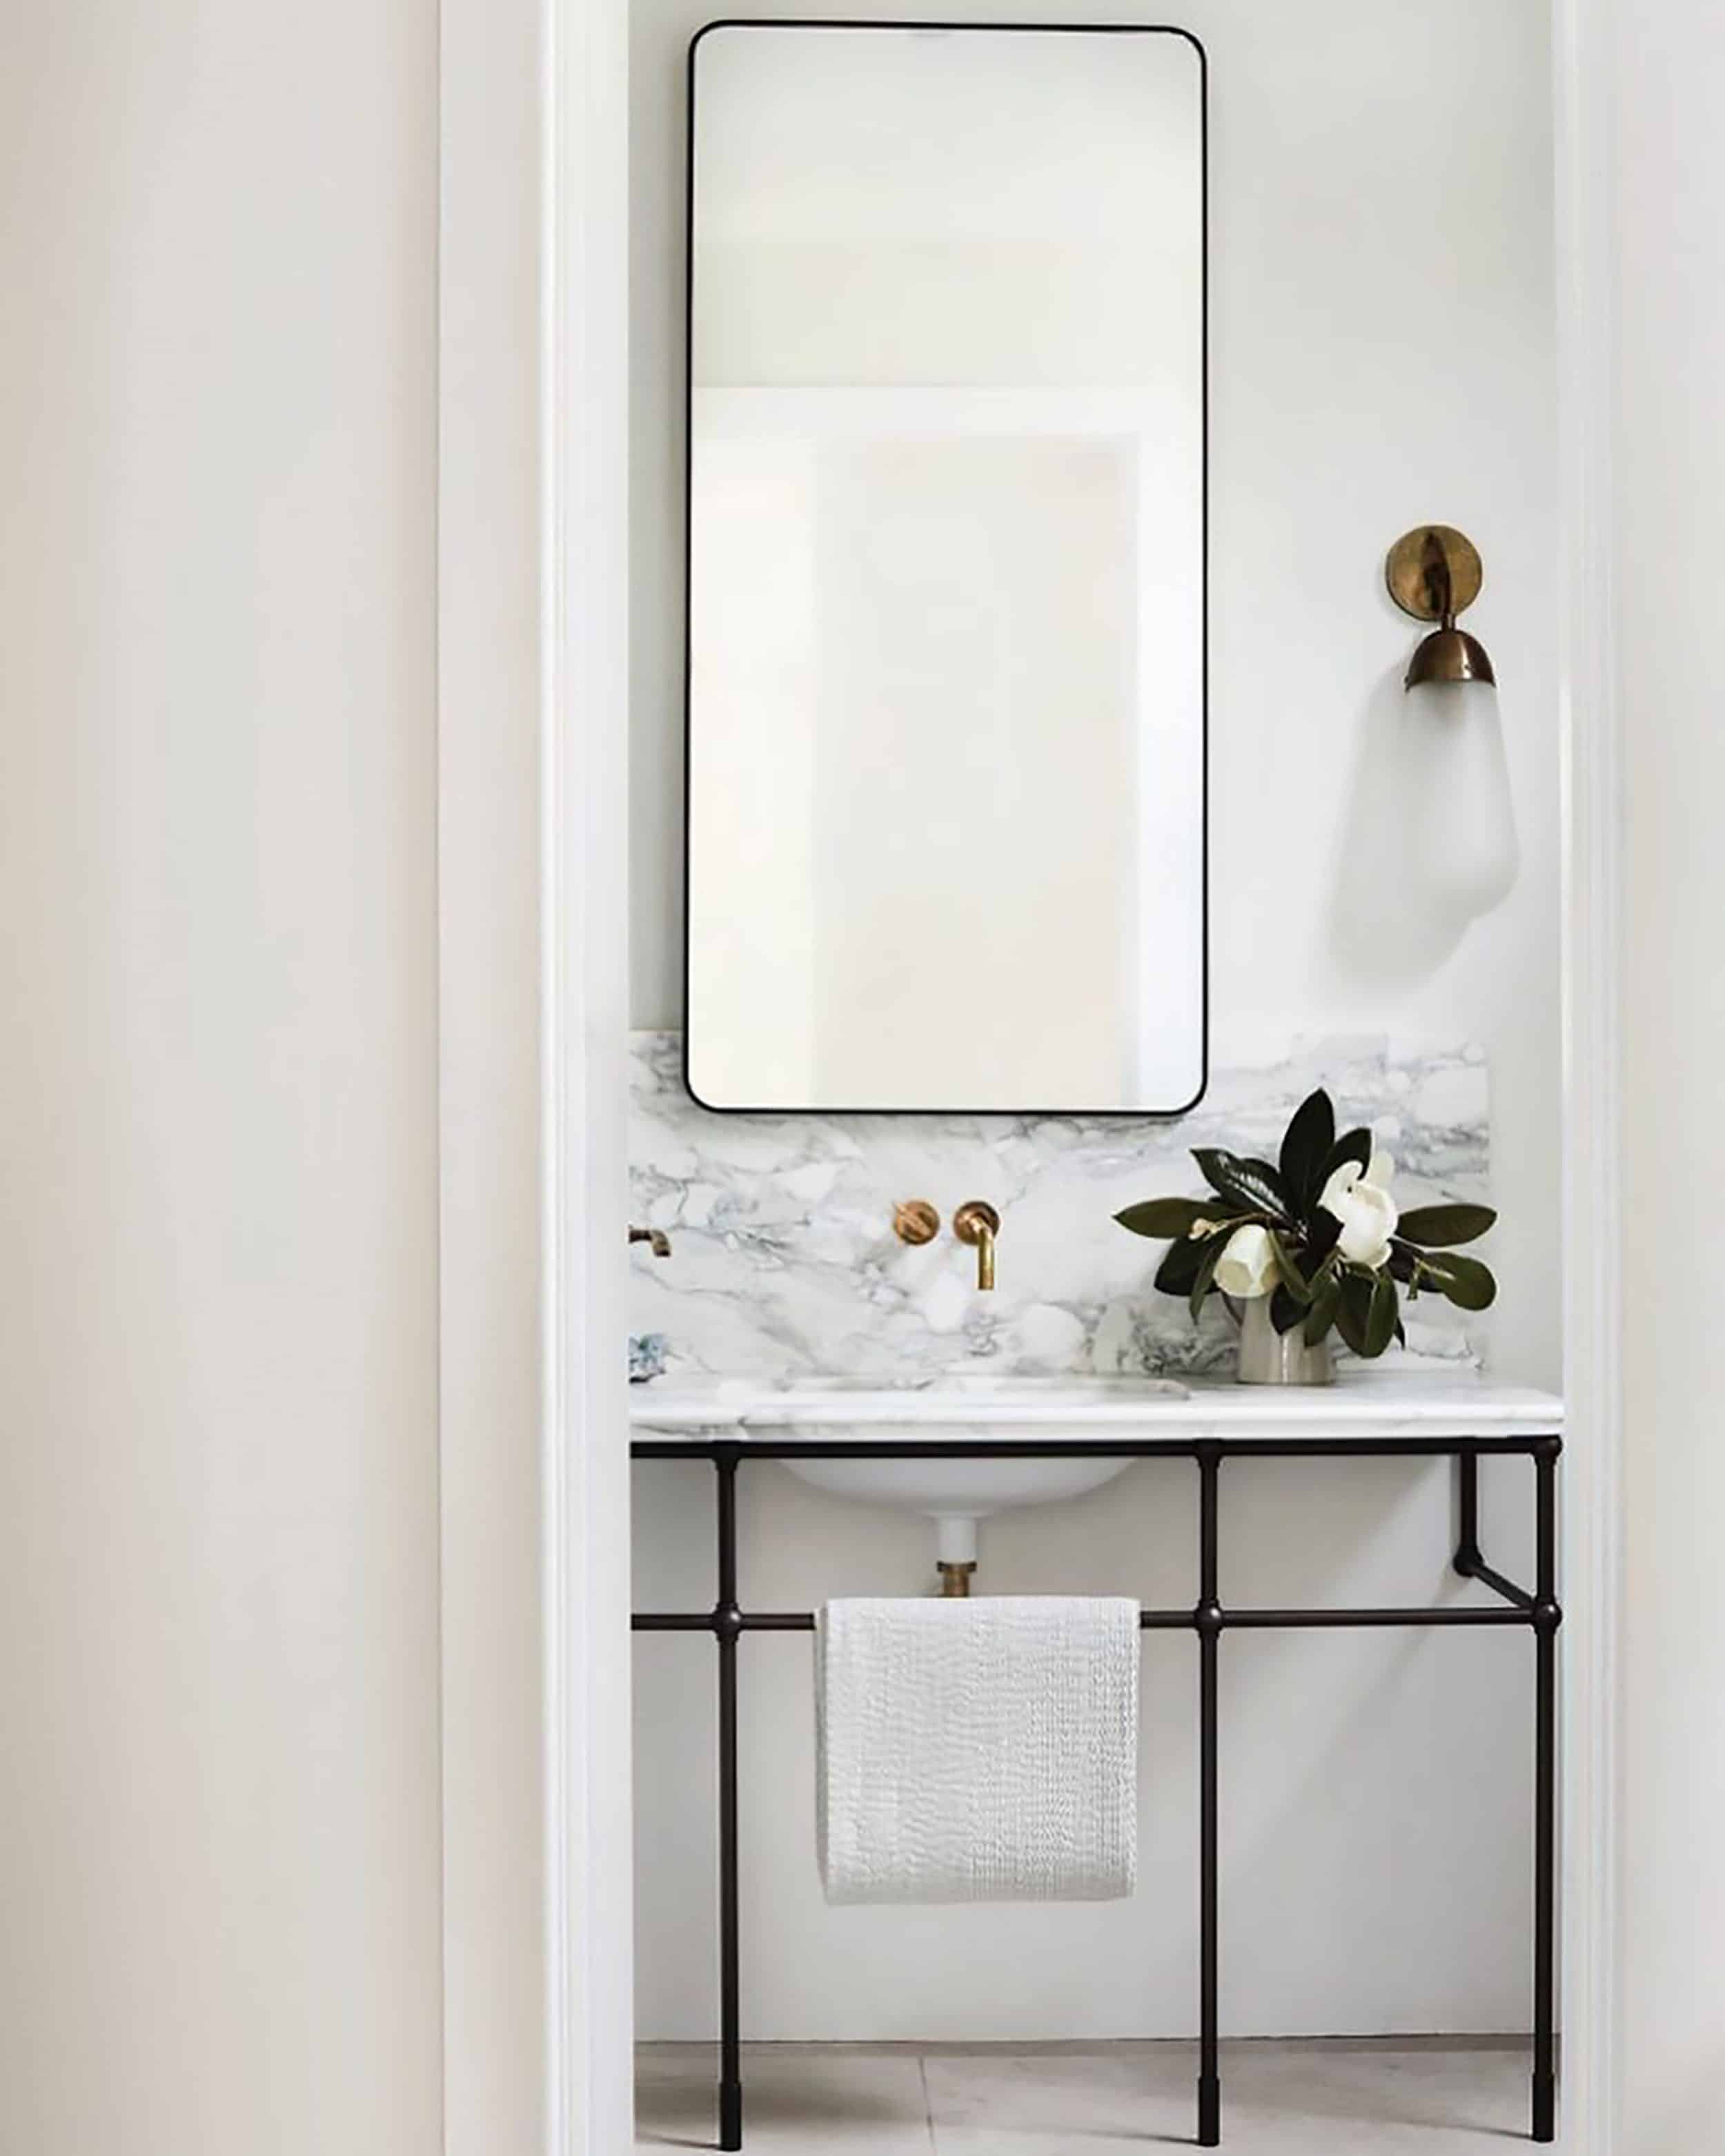 Modern Bathroom Marble Vanity With Tall Mirror